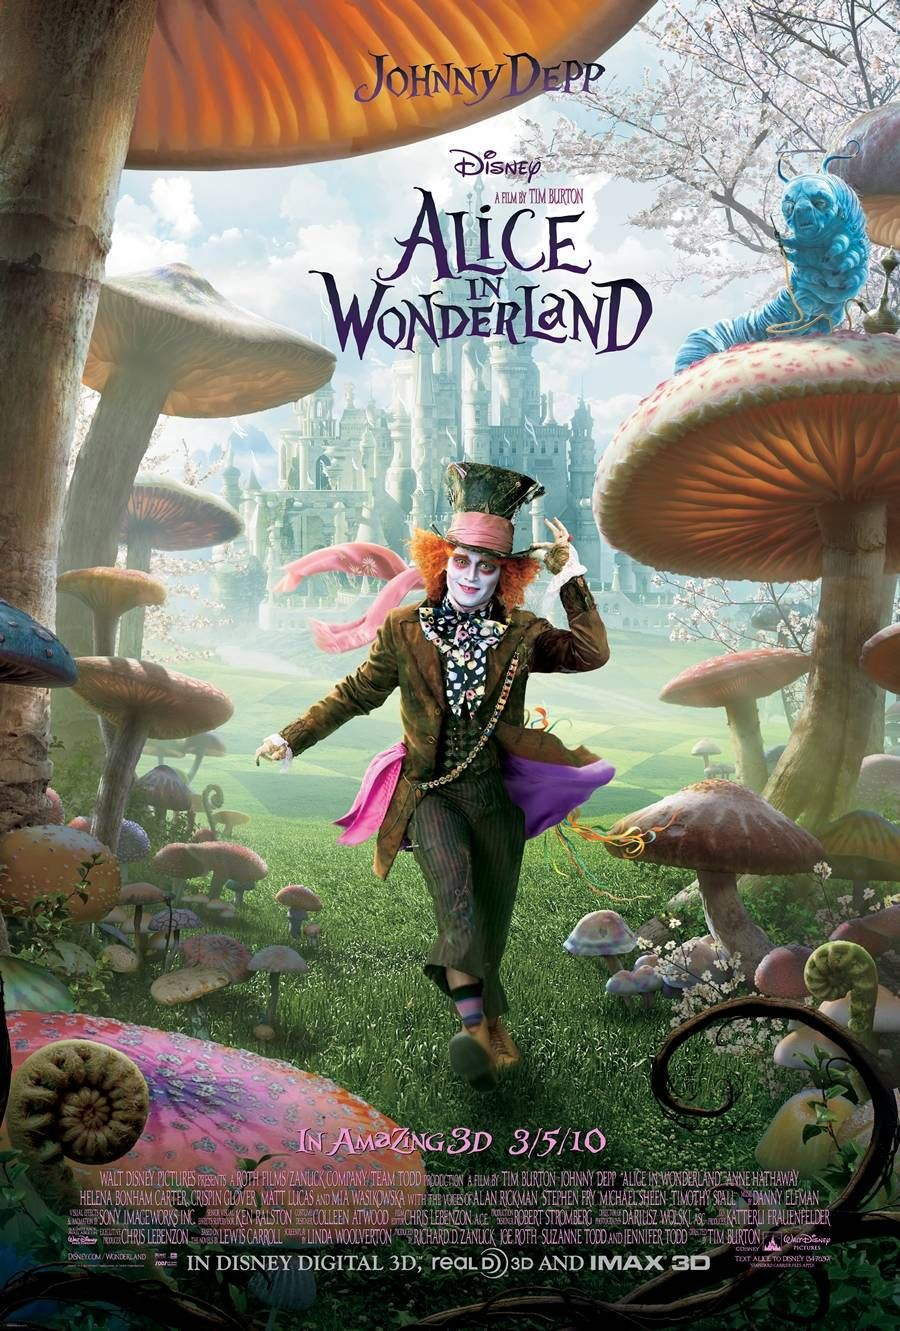 Alice In Wonderland. All time favorite.